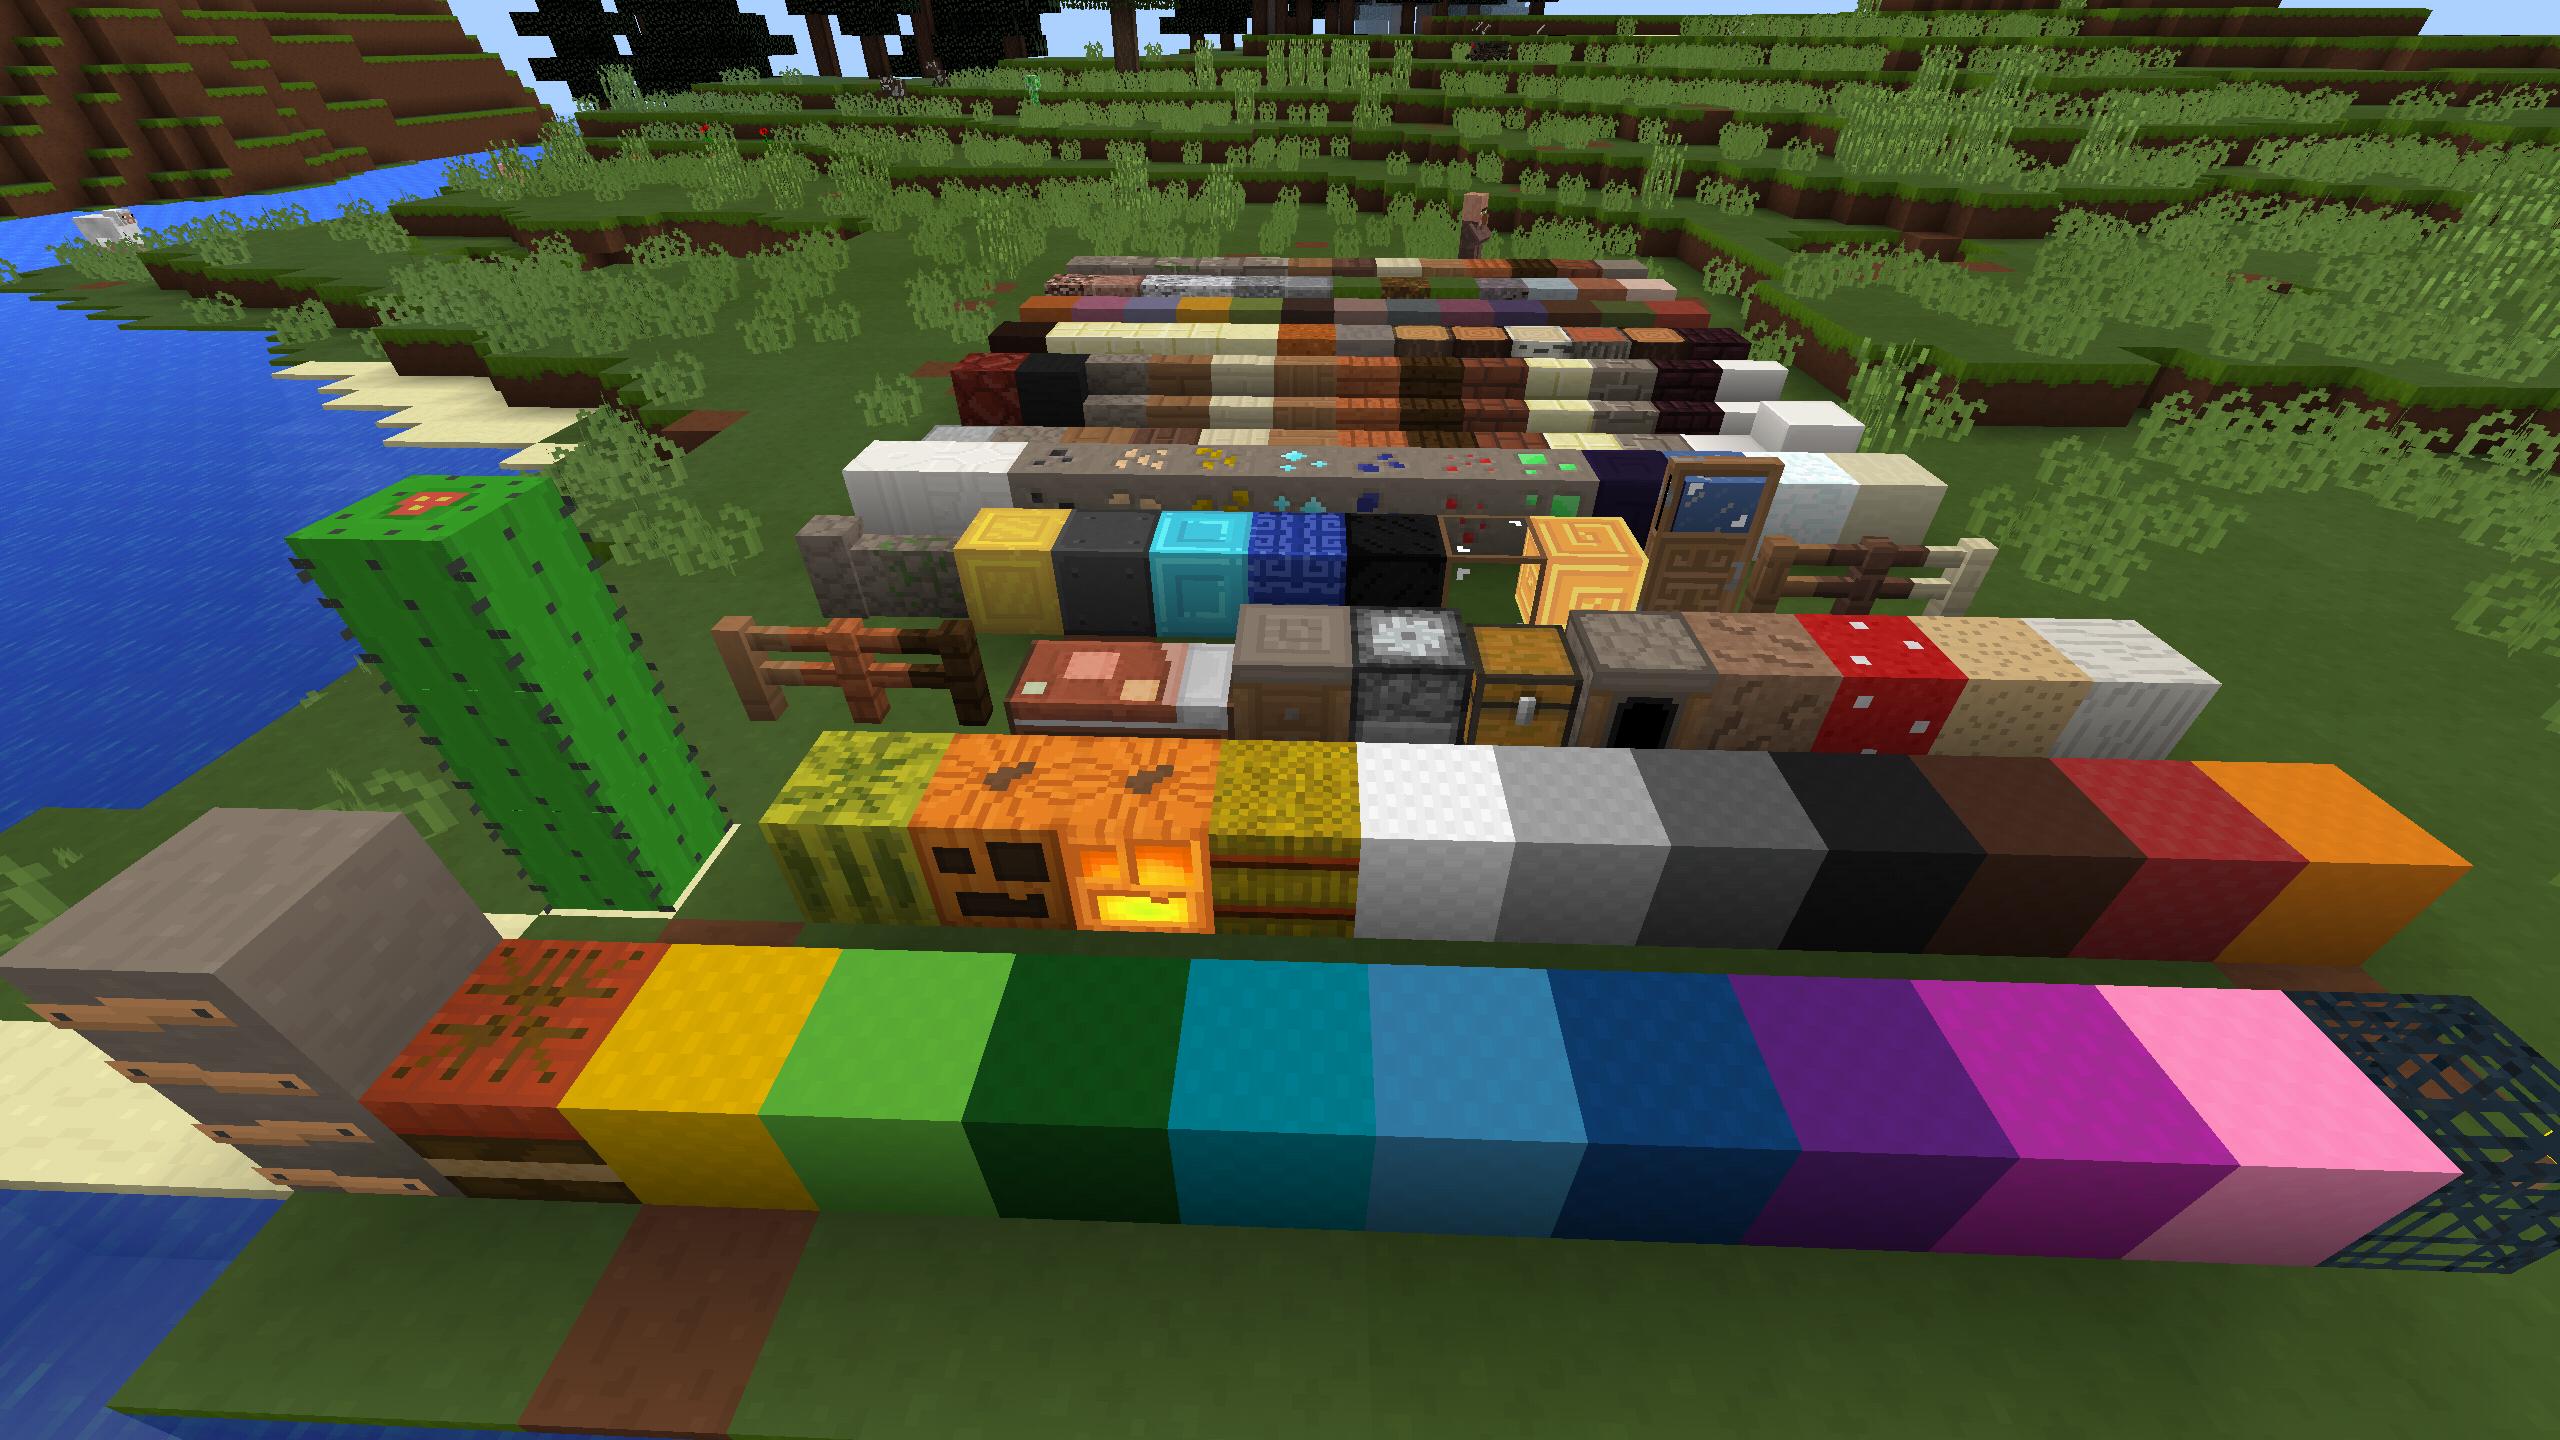 Minecraft Texture Packs | MinecraftSix